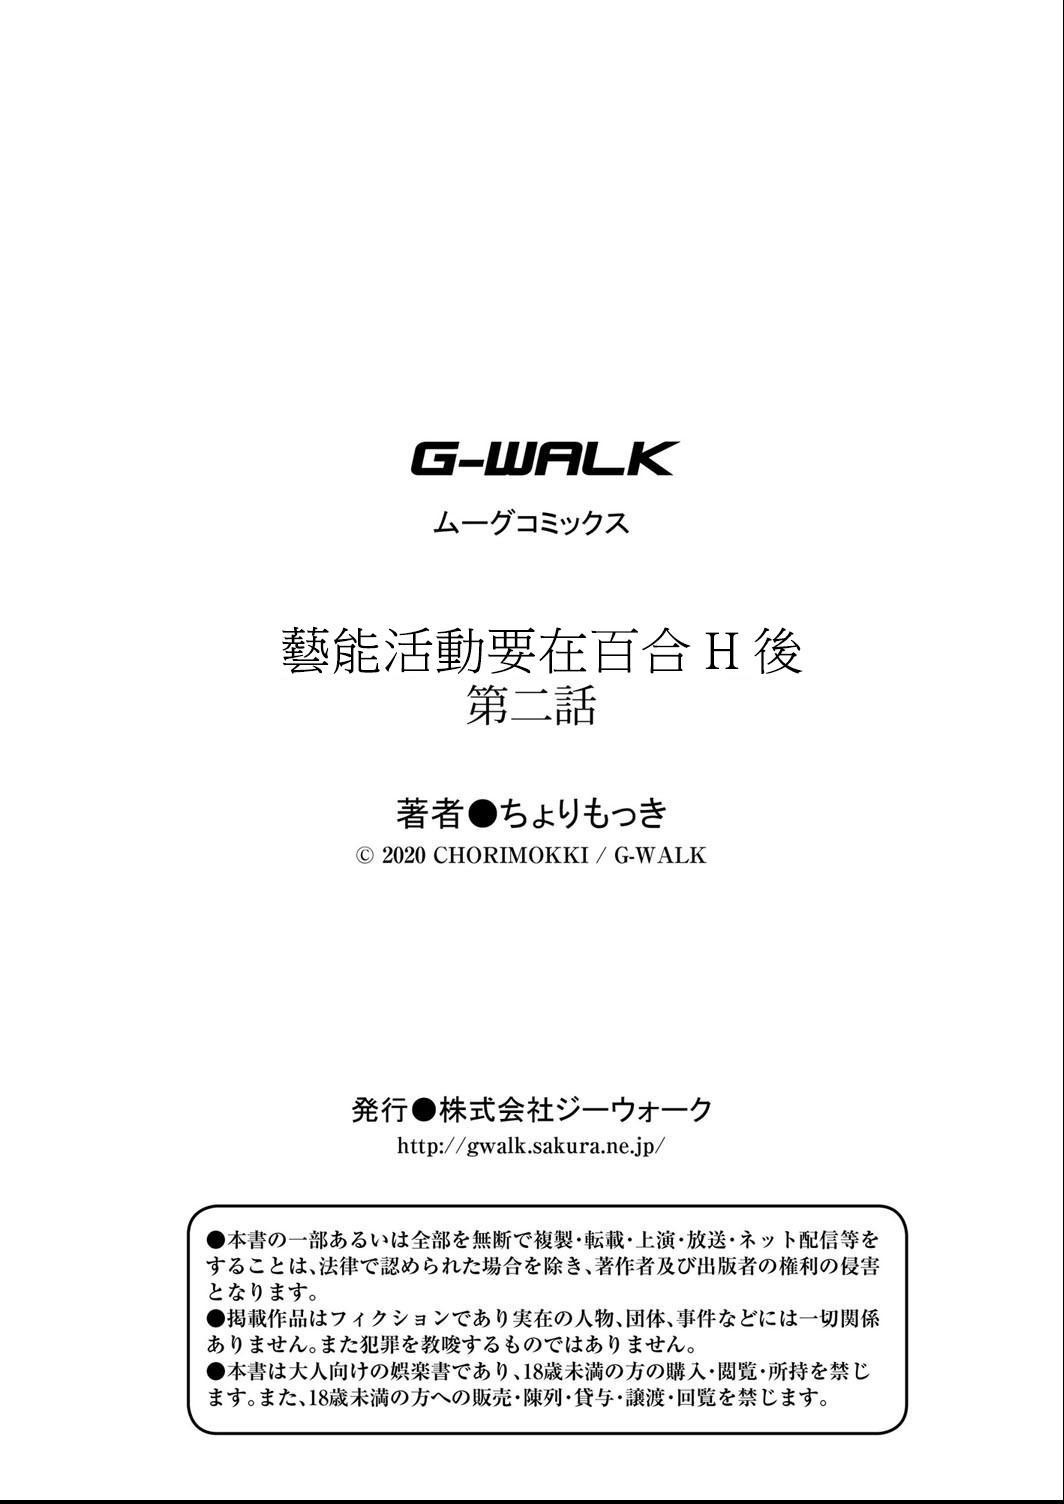 [Cyori Mokki] Geinou  Katsudou wa Yuri Ecchi no atode ch.1-3 丨藝能活動要在百合H後 第1-2話  [Chinese] [沒有漢化] [Digital] 48